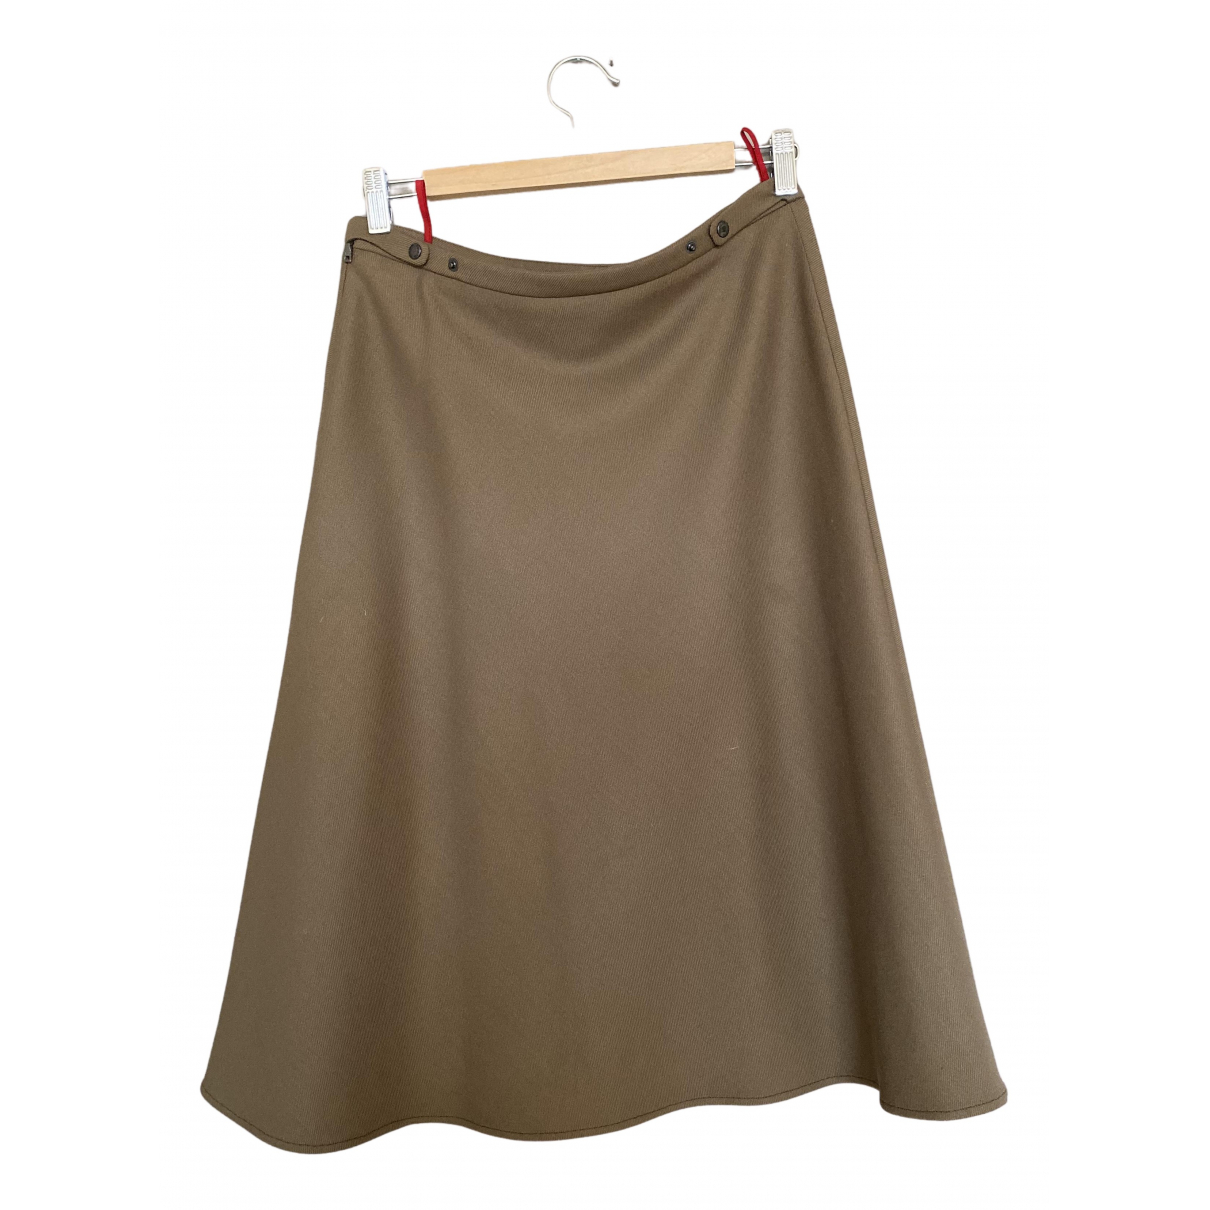 Prada \N Khaki Wool skirt for Women 10 UK